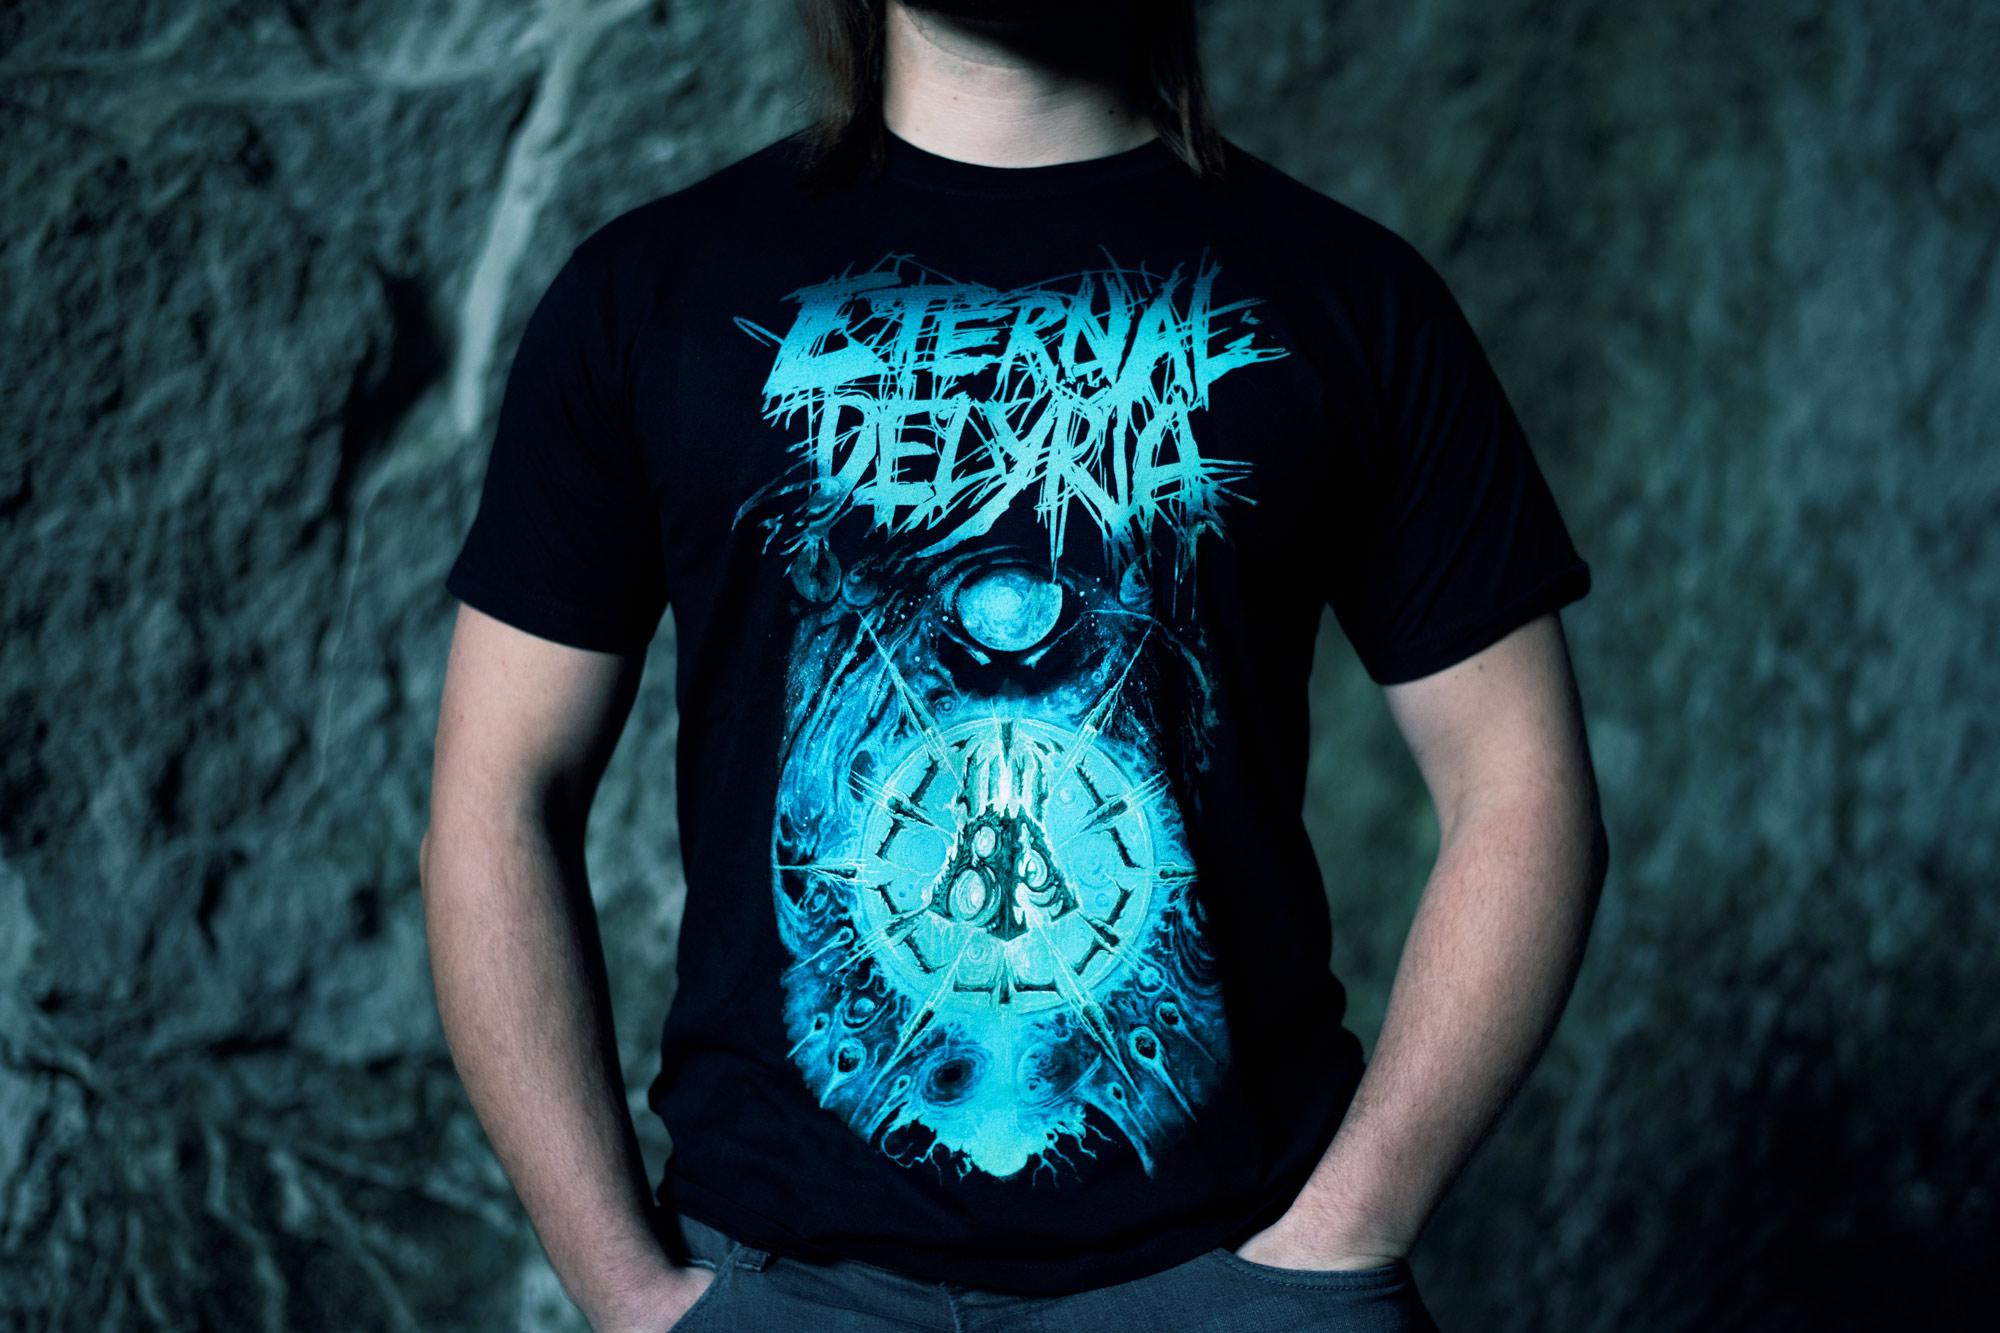 Eternal Delyria